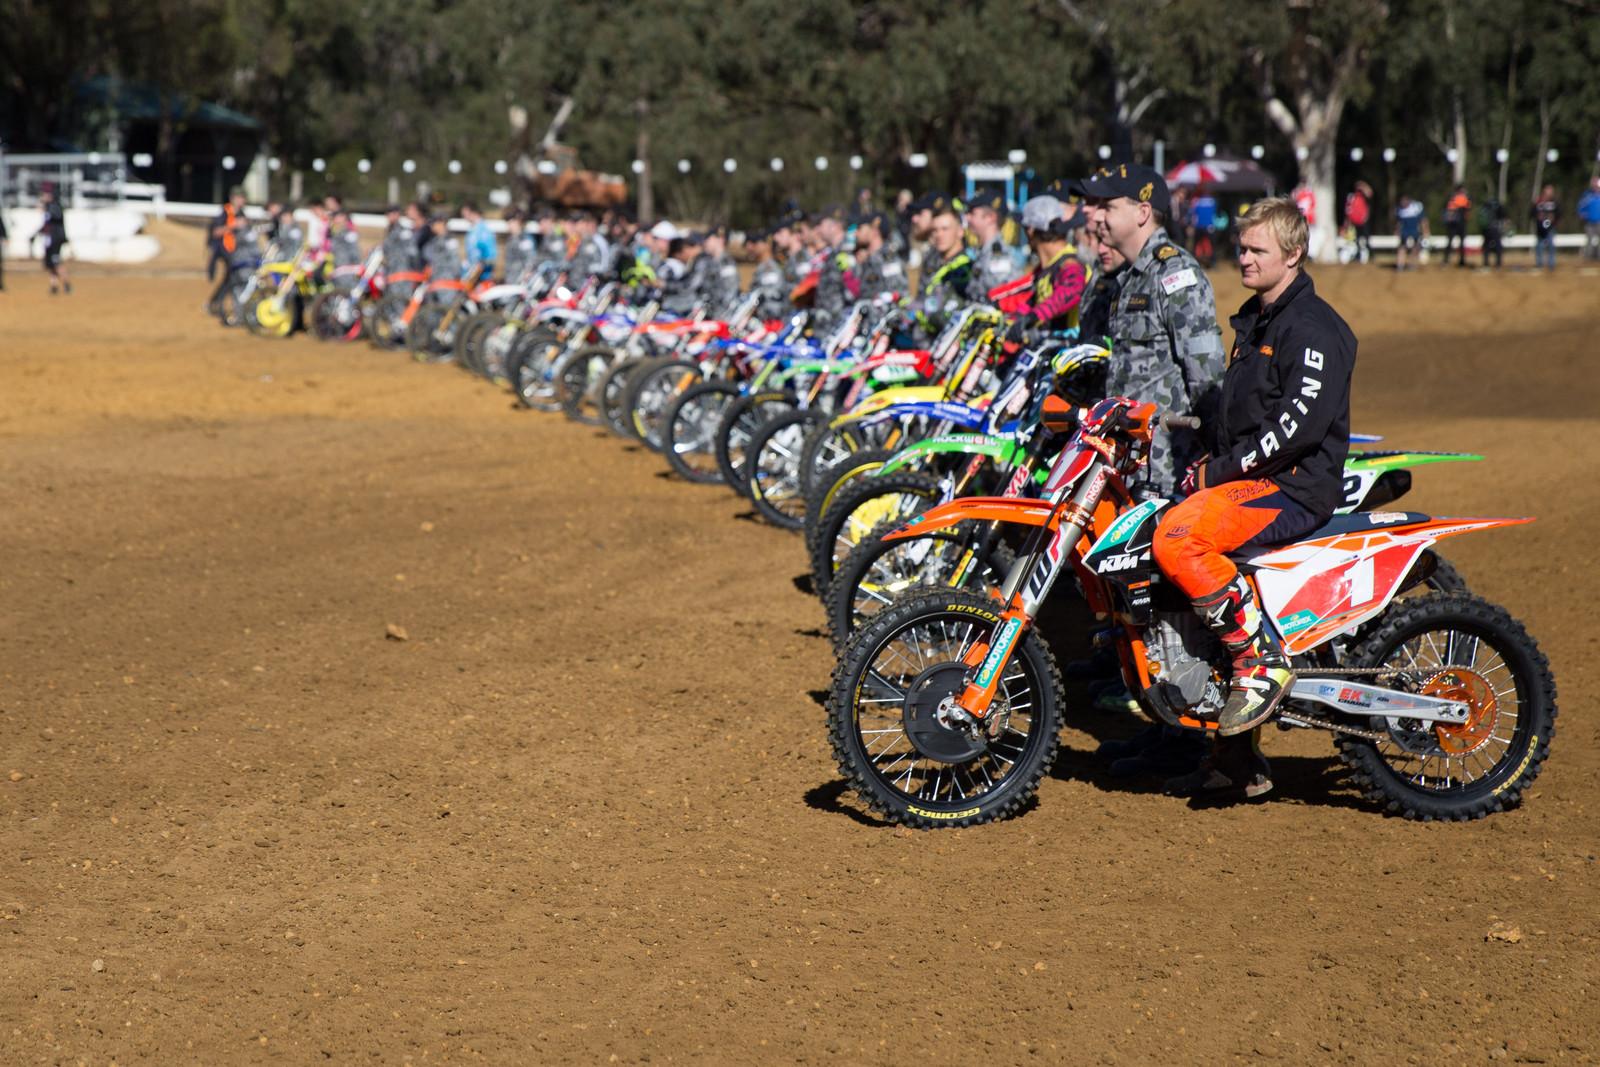 Nowra - Australian Motul MX Championships: Round 6, Nowra - Motocross Pictures - Vital MX